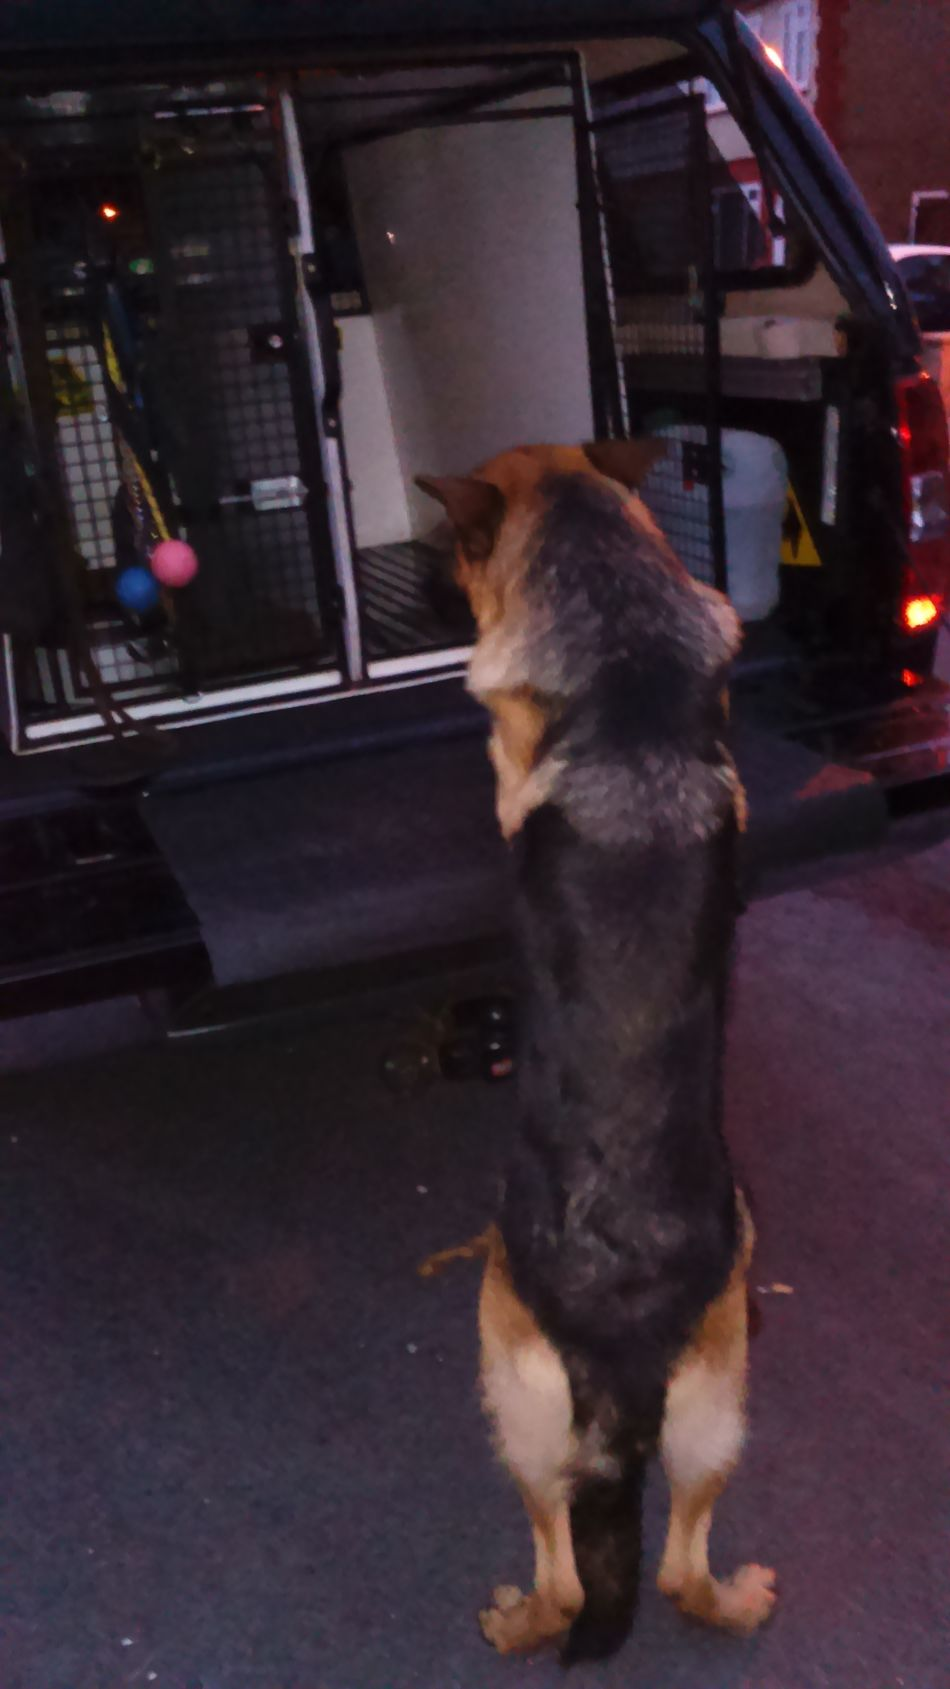 Shall I jump up! Domestic Animals Animal Themes One Animal Dog German Shepherd Standing Car Car Boot One Dog Night Night Shot Canine Outdoors